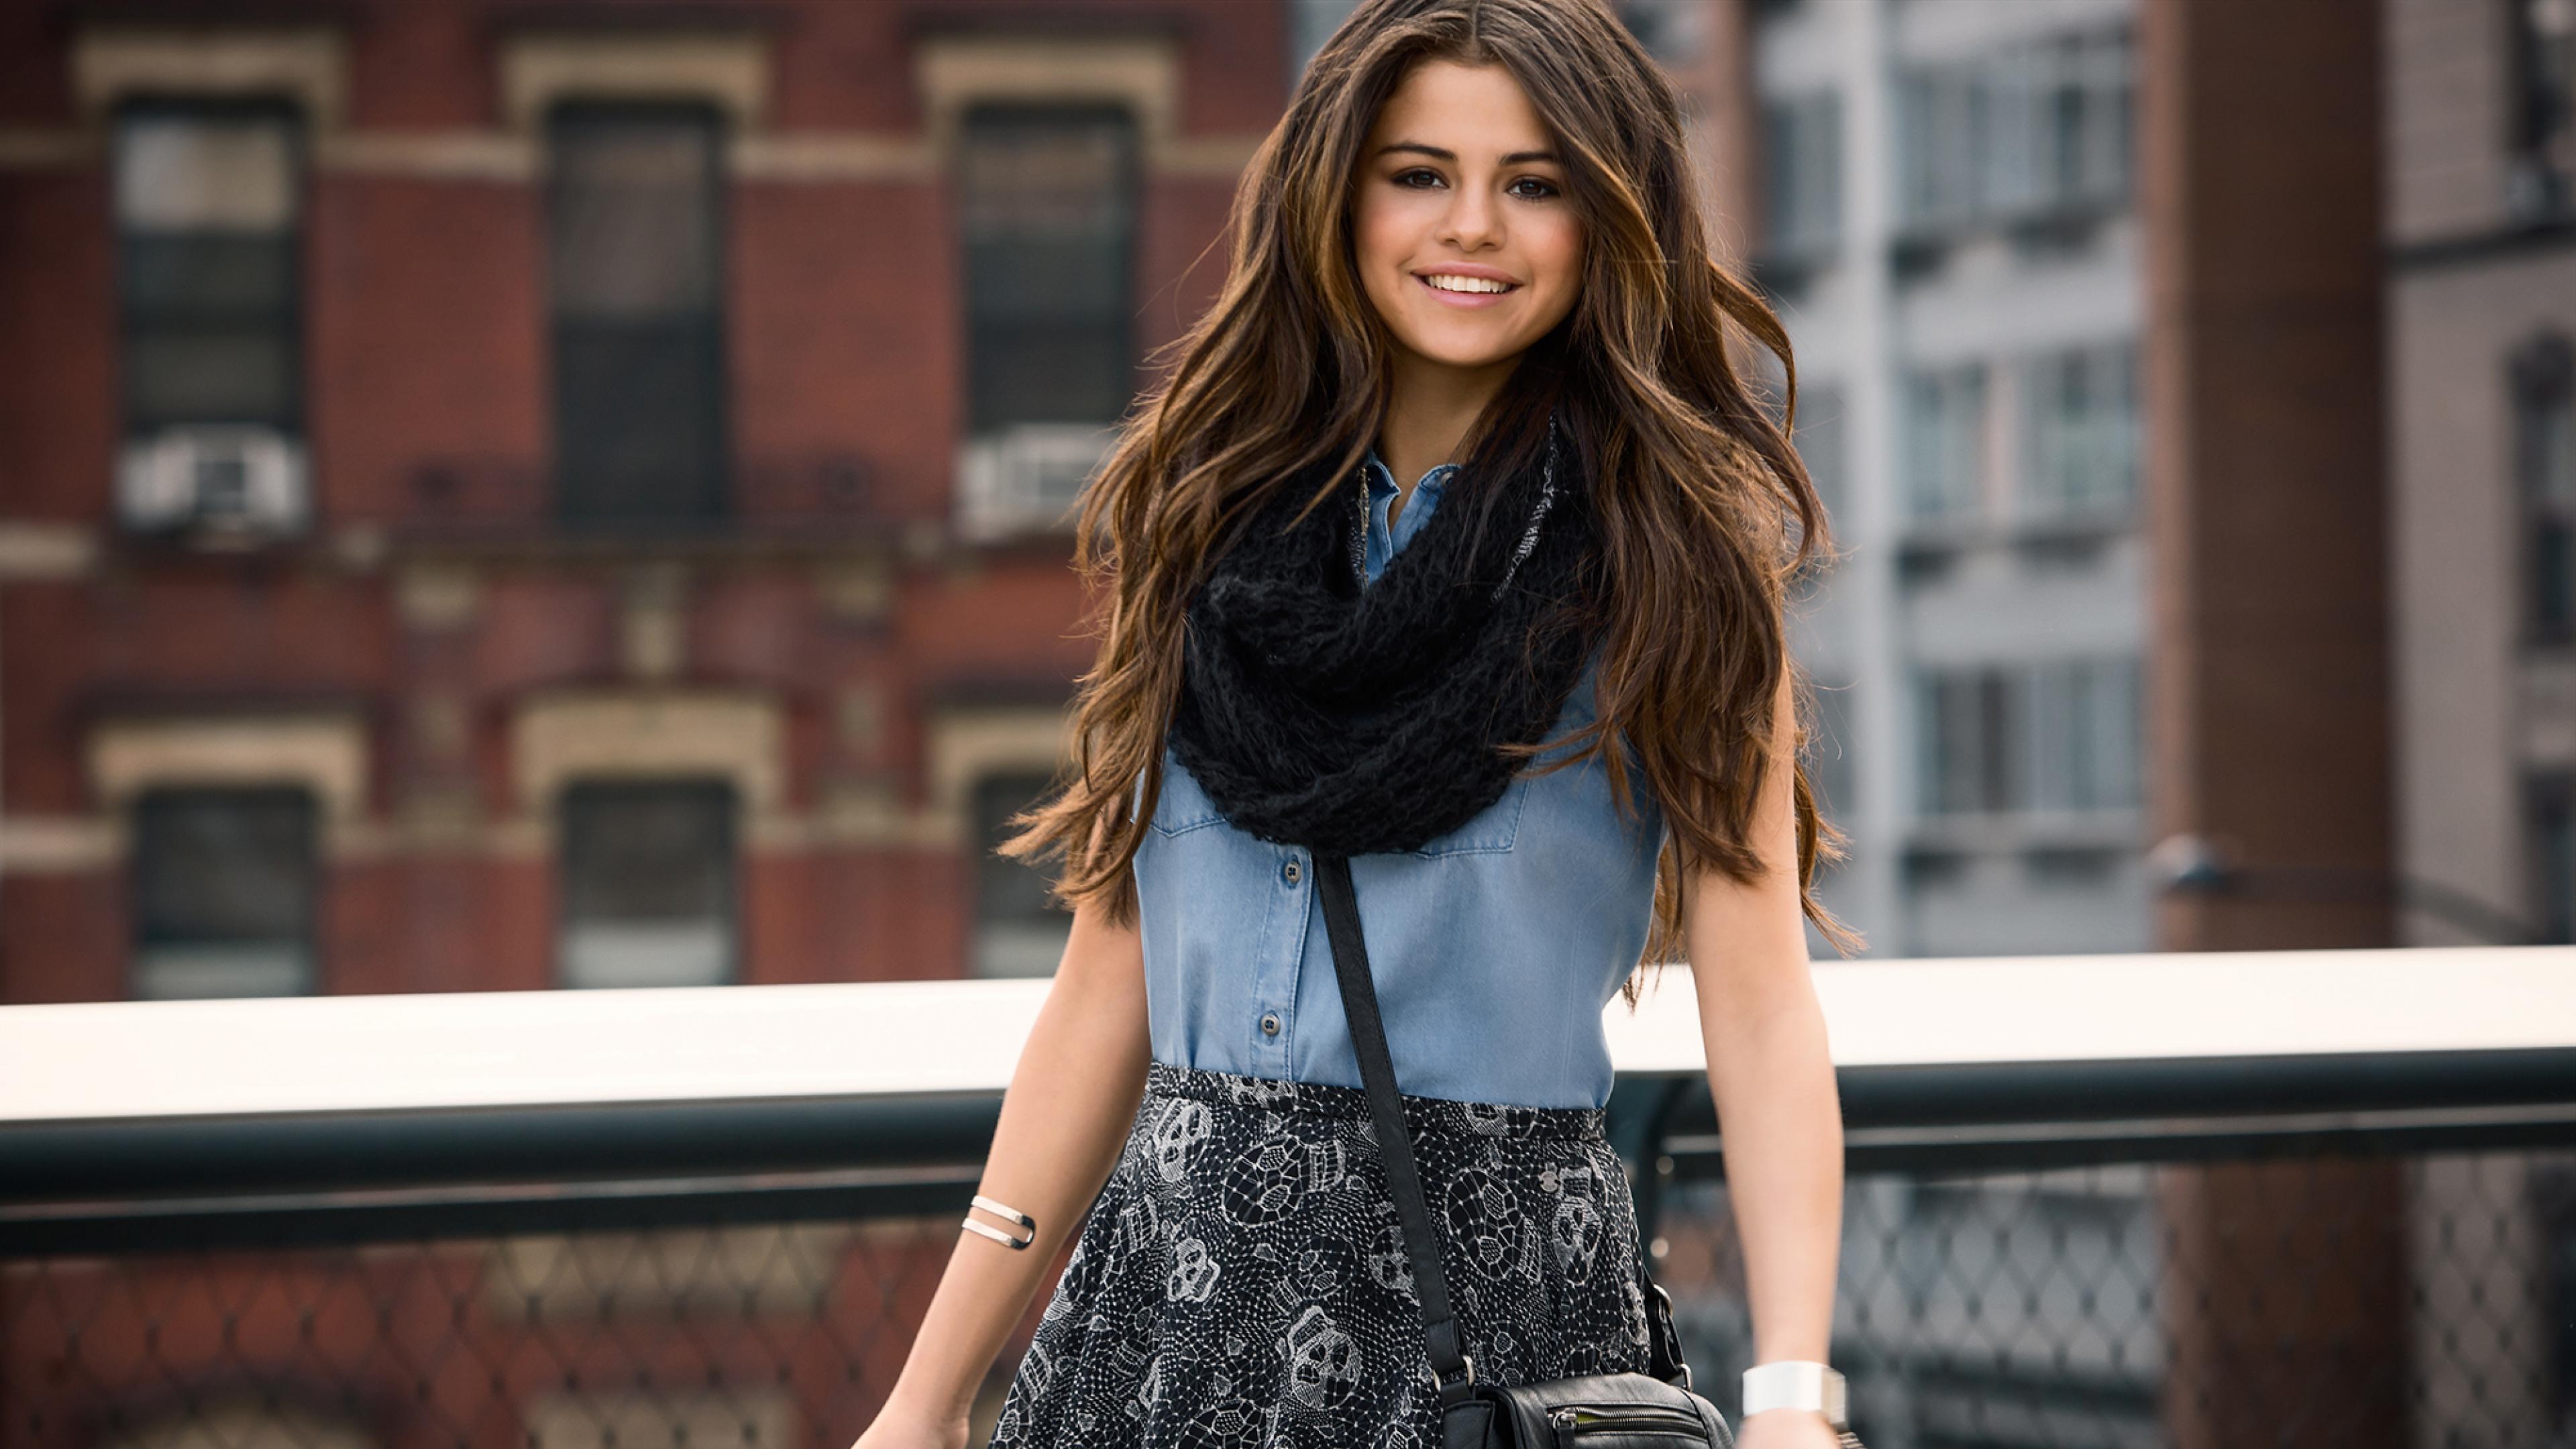 Wallpaper Selena Gomez Hd Celebrities 7259: Selena Gomez 3, HD Celebrities, 4k Wallpapers, Images